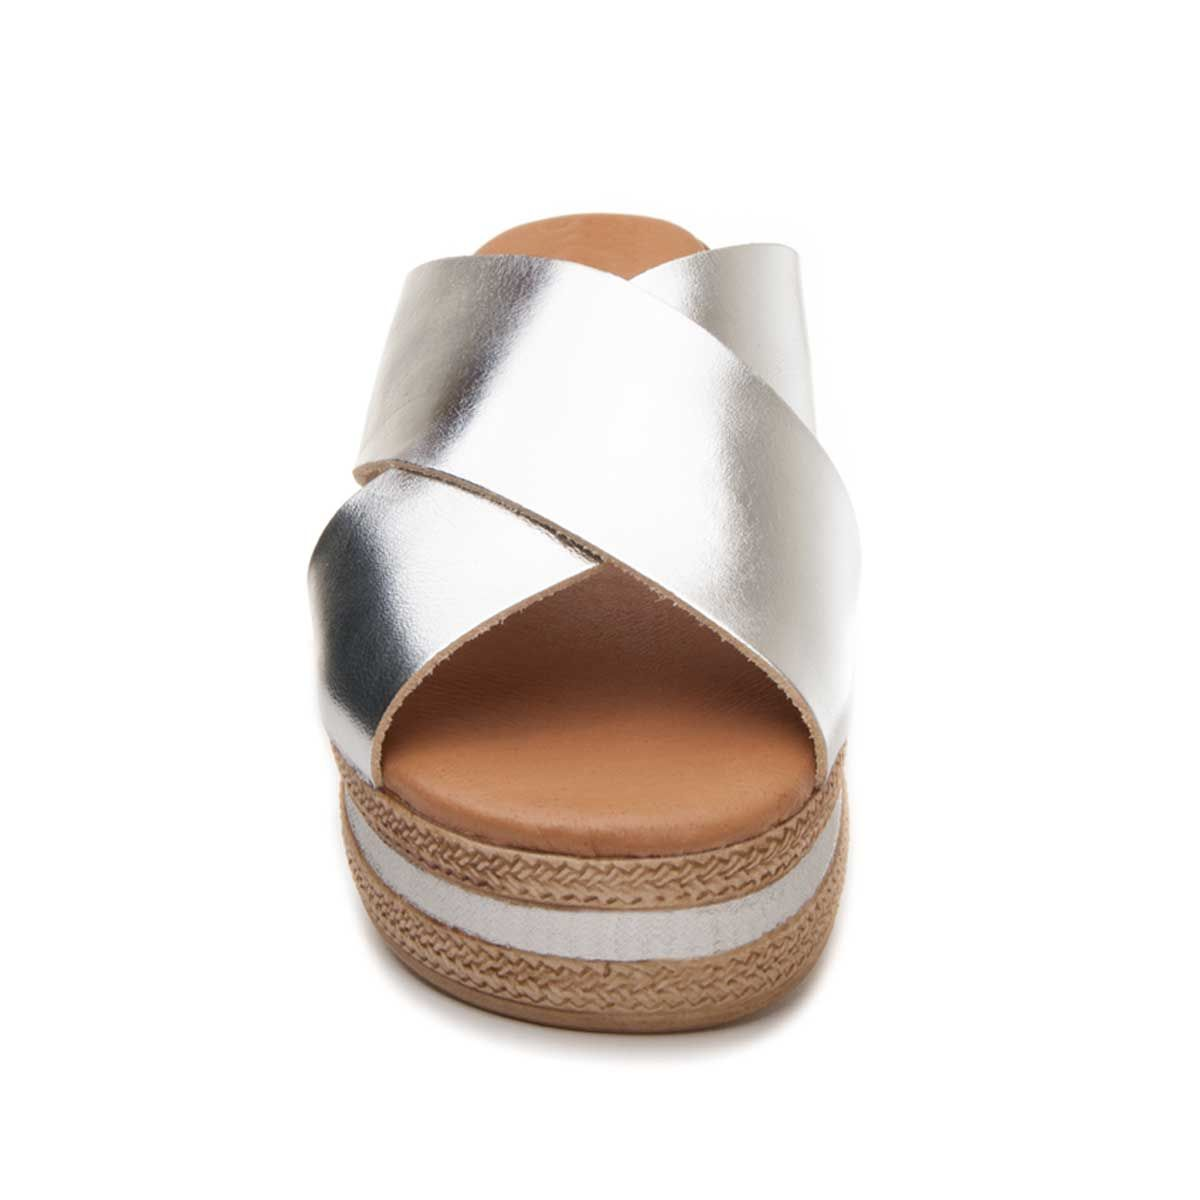 Purapiel Cross Strap Chunky Sandal in Silver